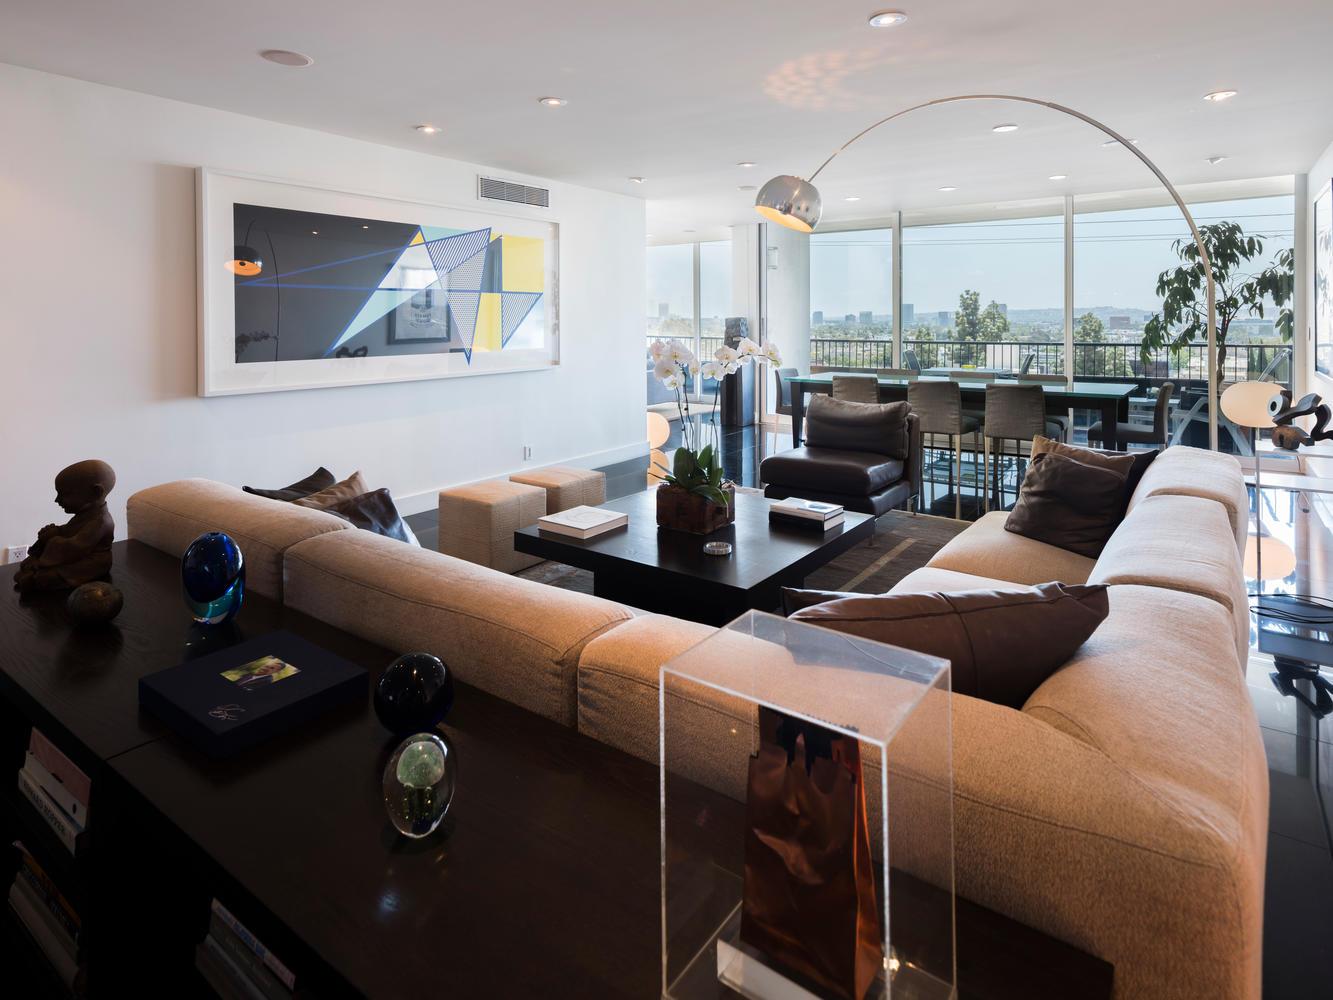 1100 Alta Loma Rd West-large-007-21-Living Room-1334x1000-72dpi.jpg